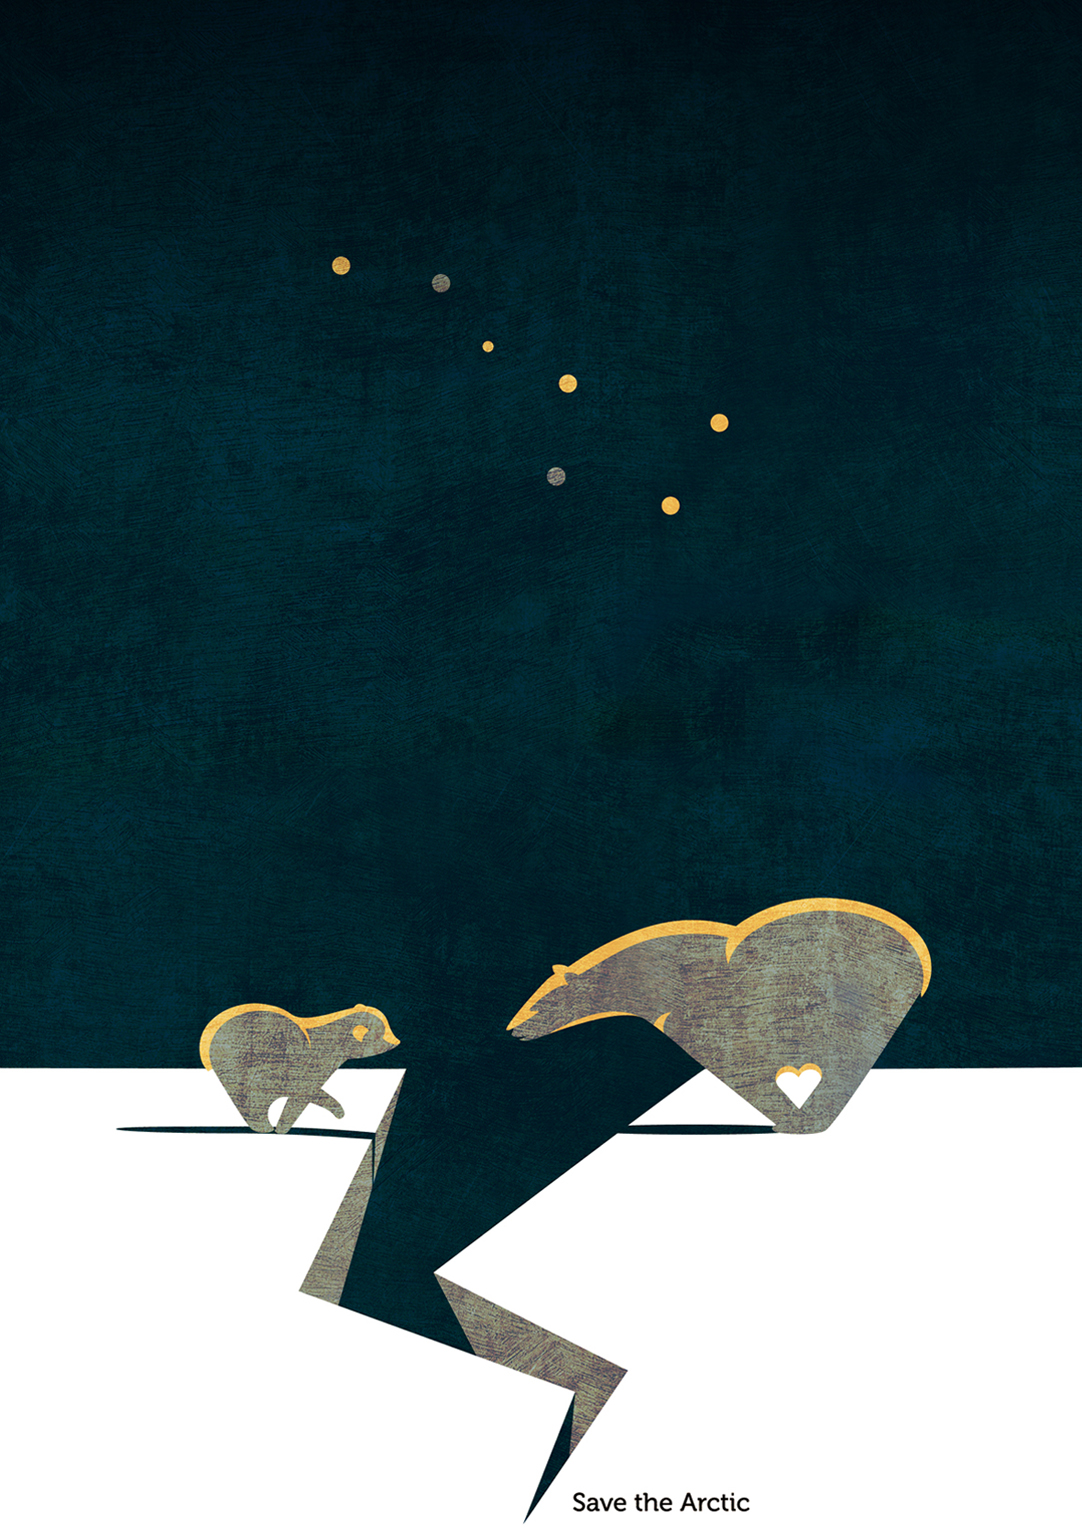 Save the Arctic - digital illustration by Daria Kirpach - http://www.dariakirpach.com/ - http://www.salzmanart.com/